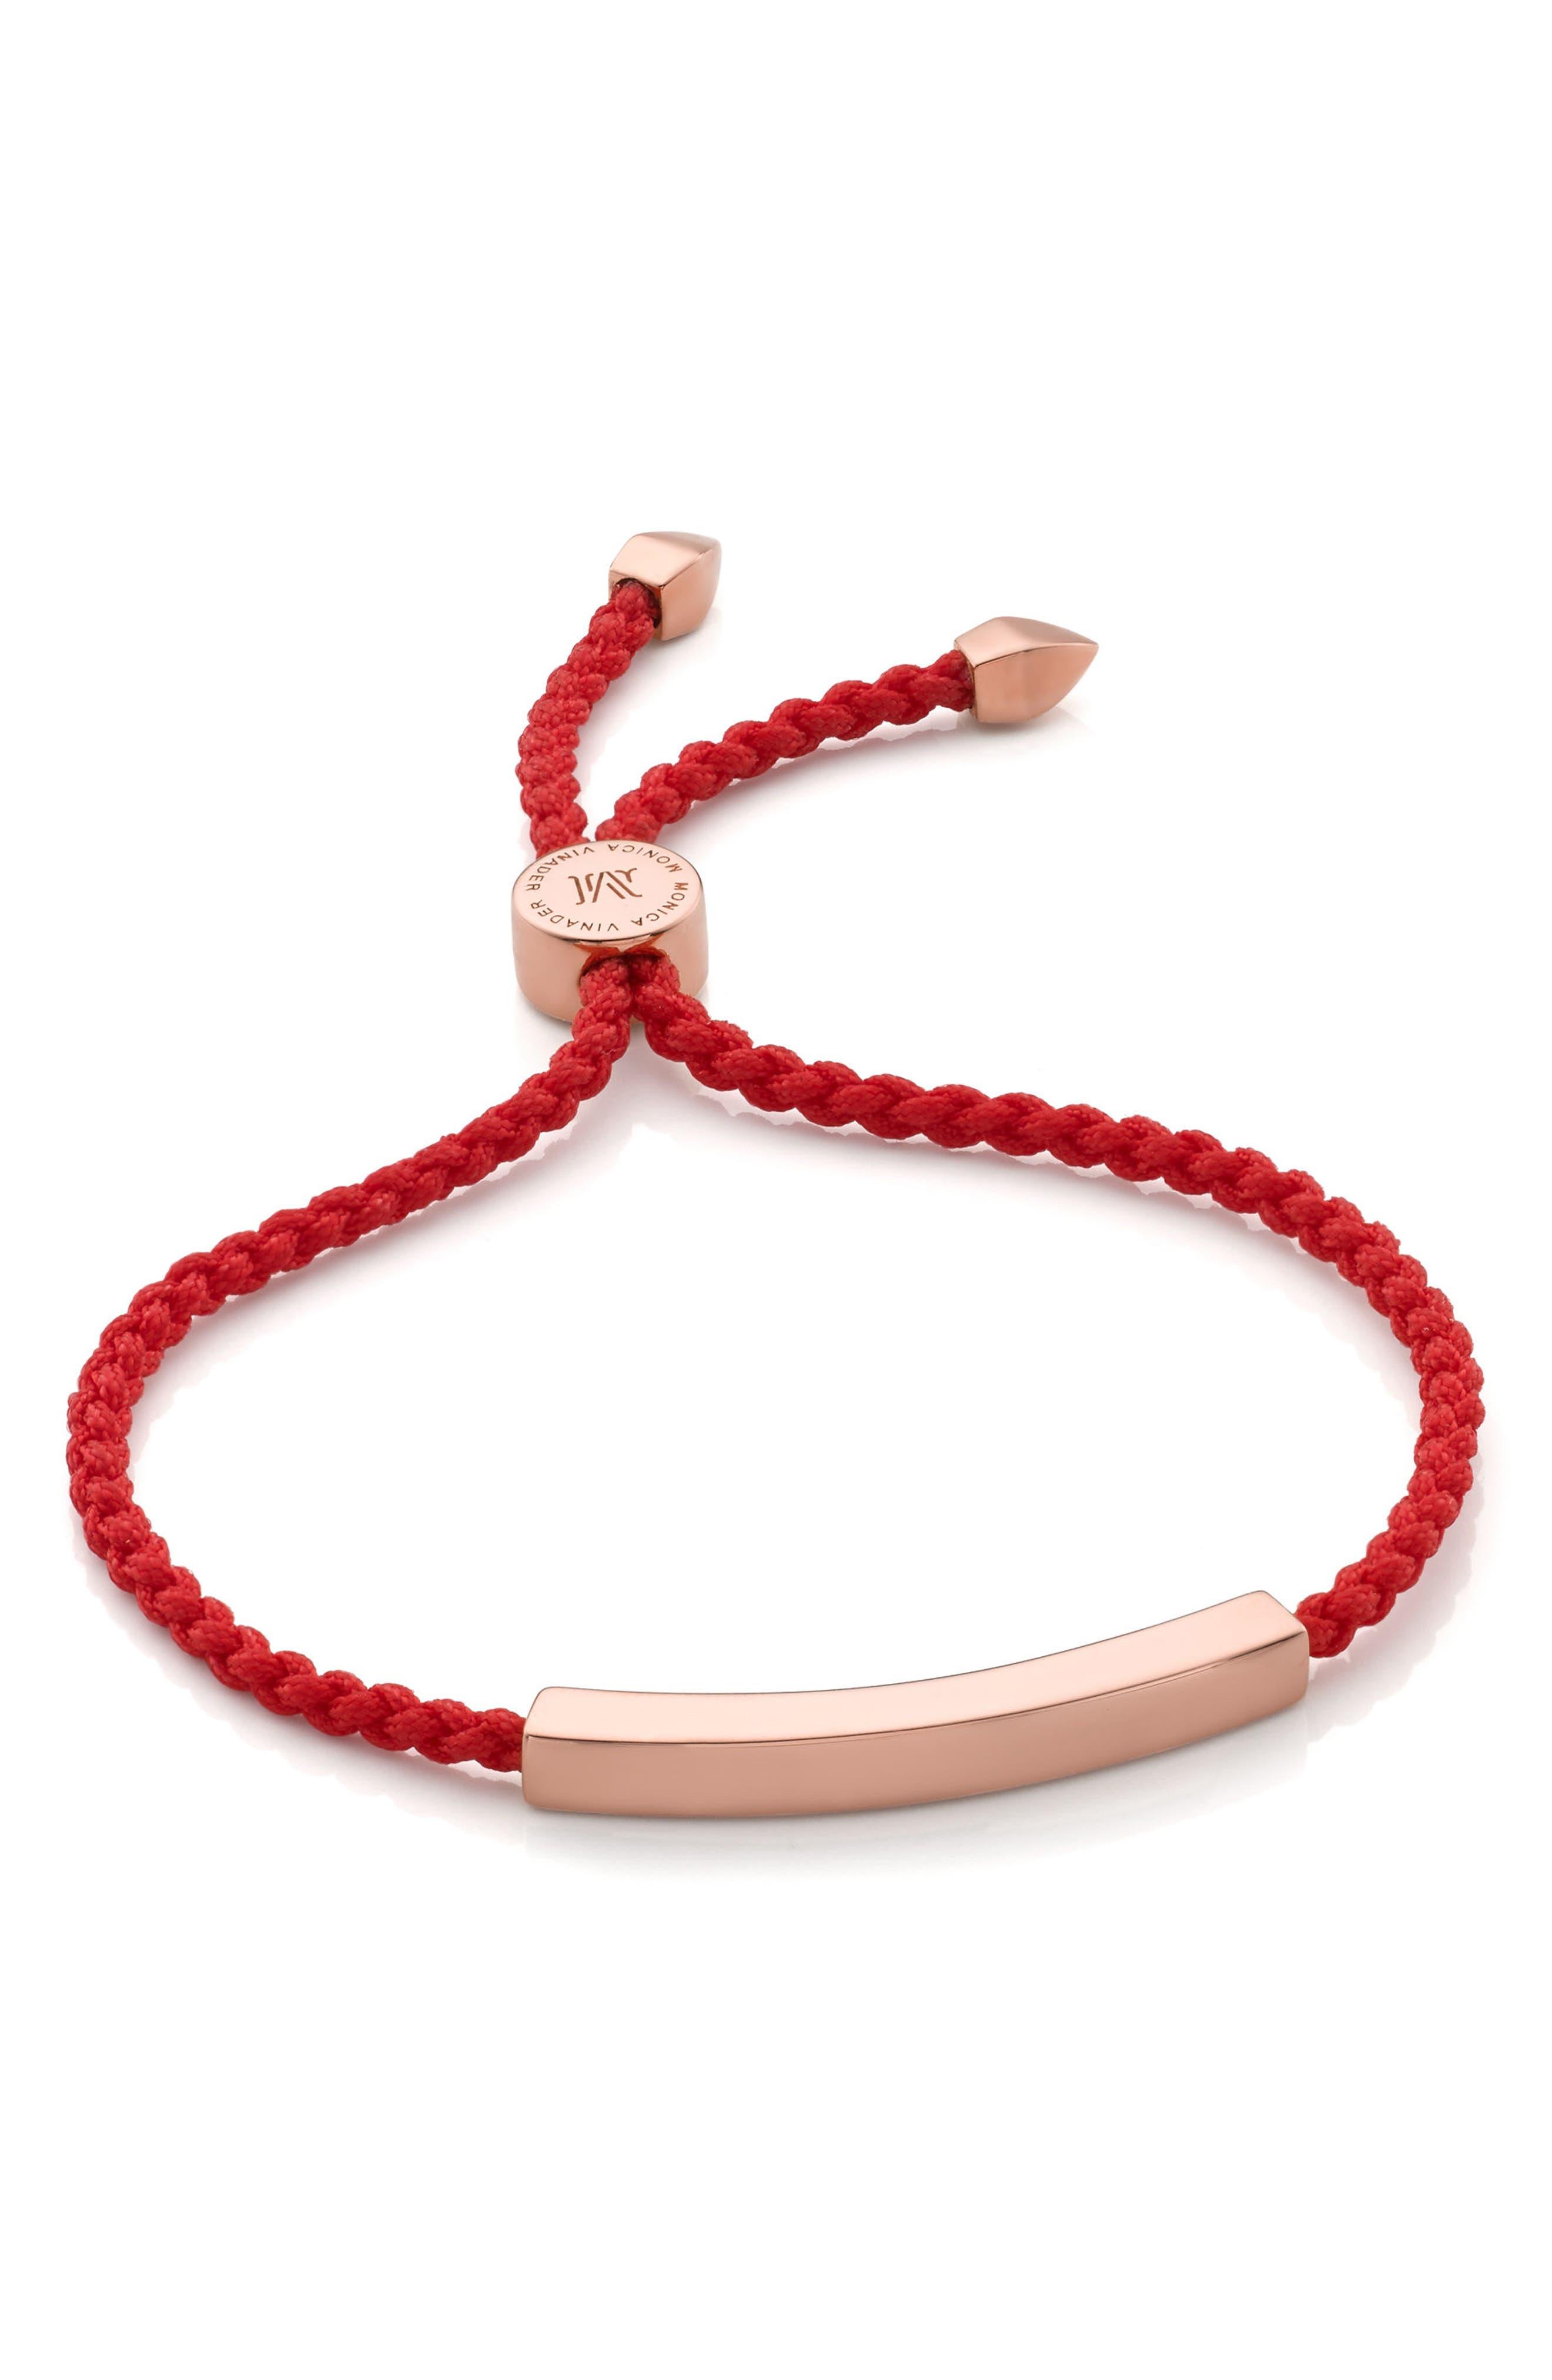 Main Image - Monica Vinader Linear Bar Friendship Bracelet